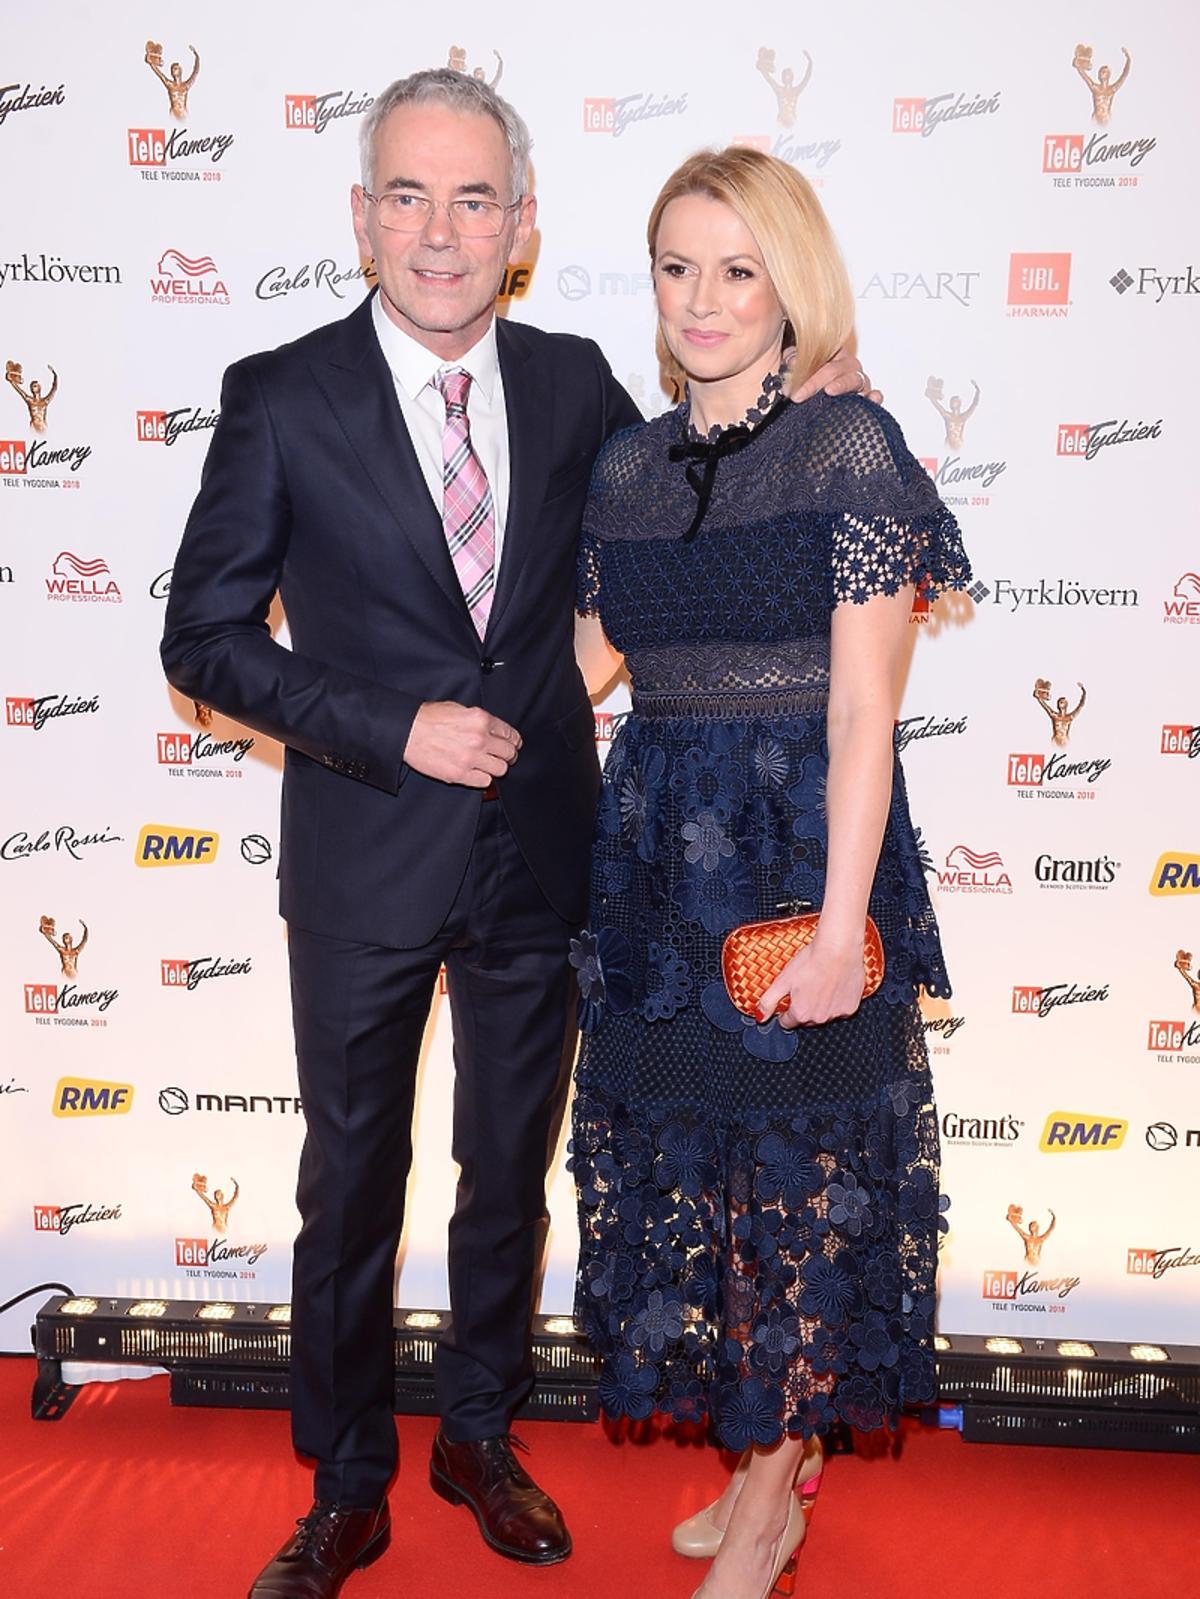 Robert Janowski z żoną na Telekamerach 2018